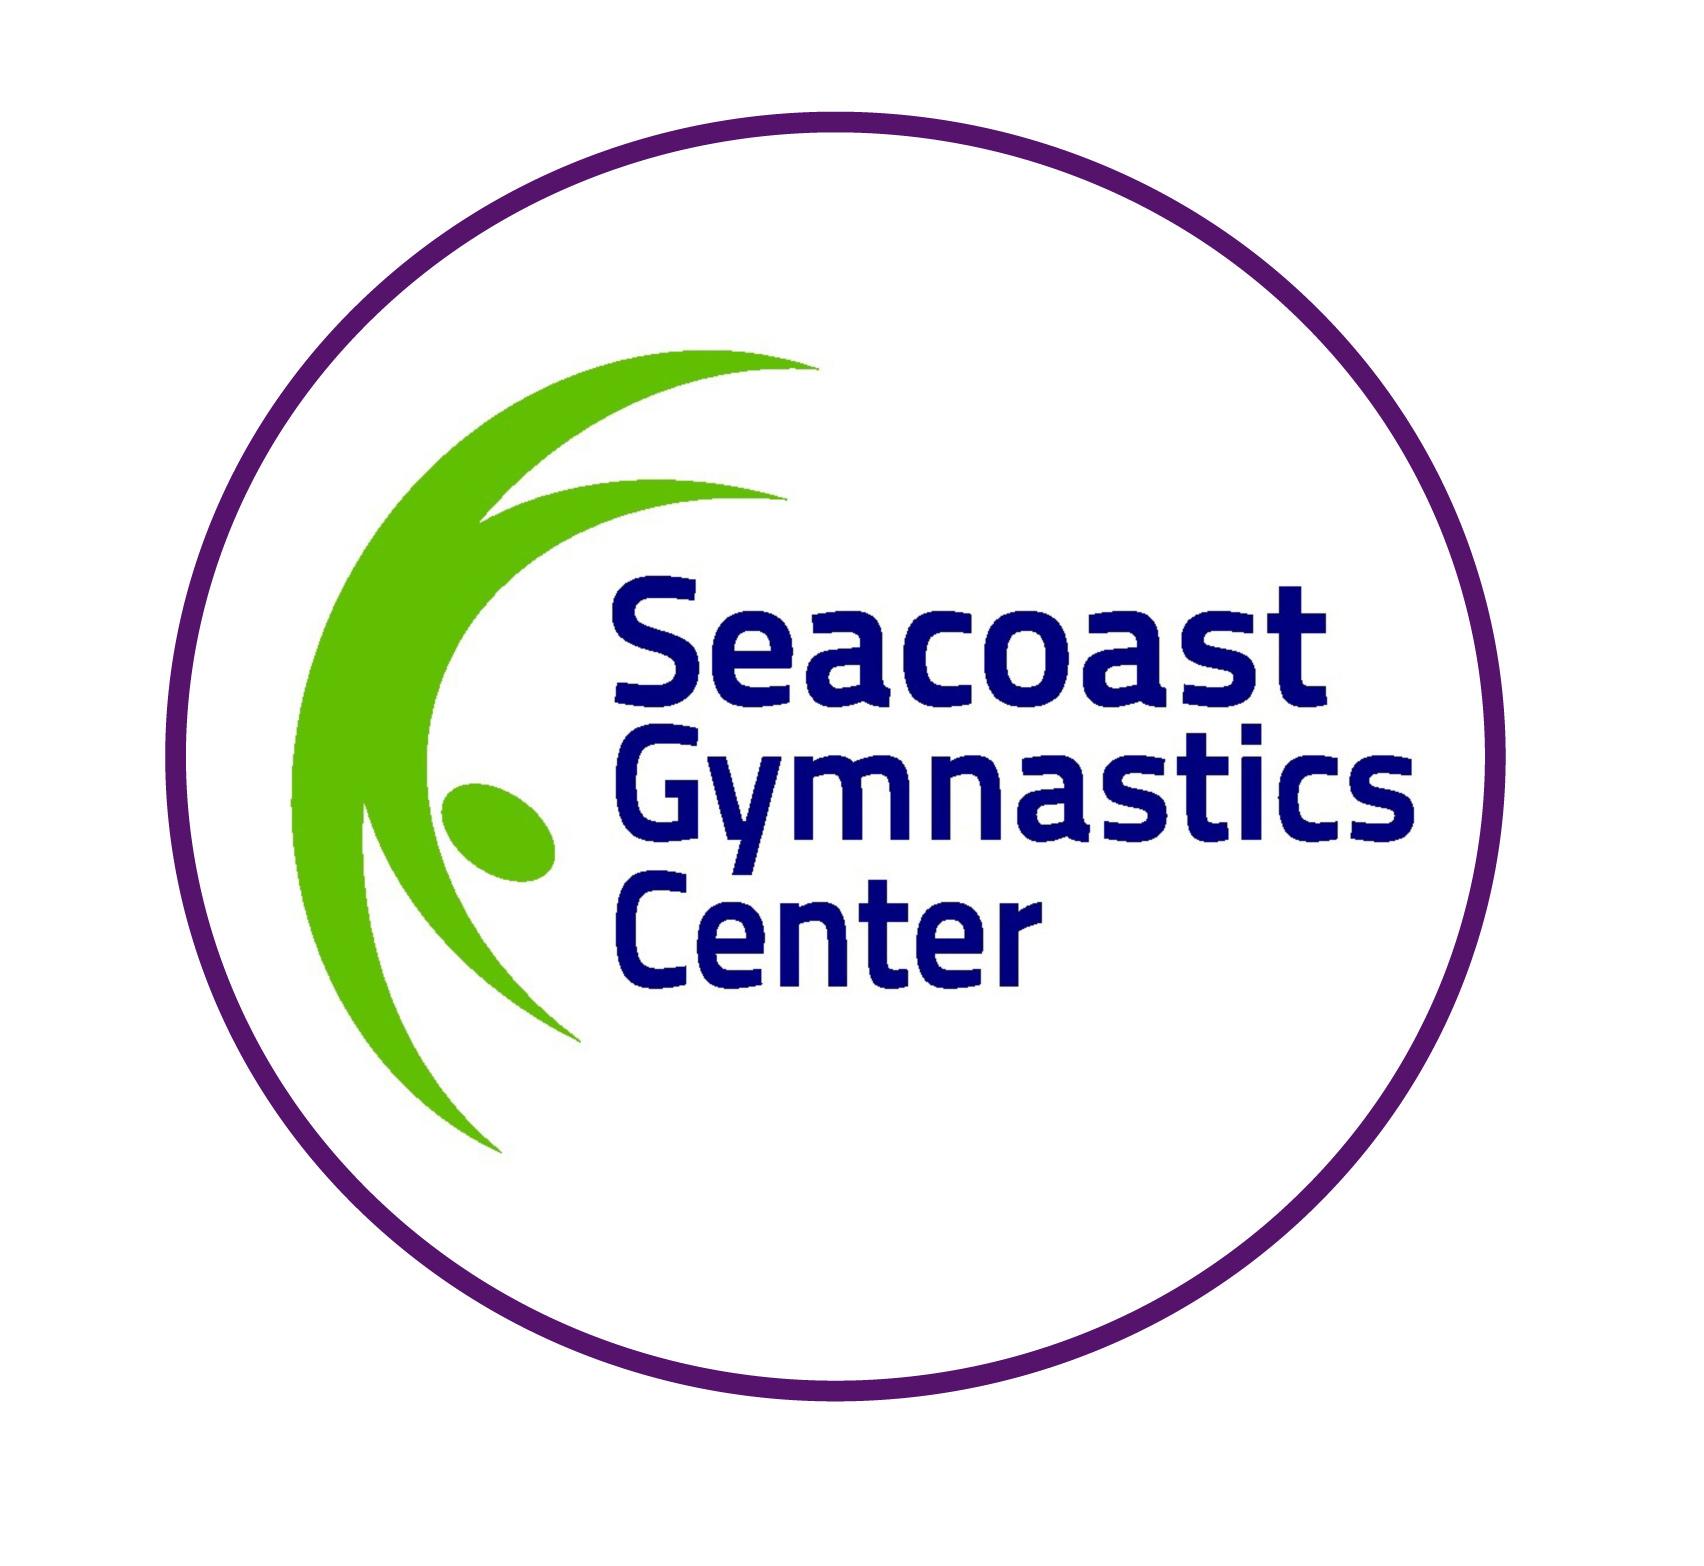 Seacoast Gynastics